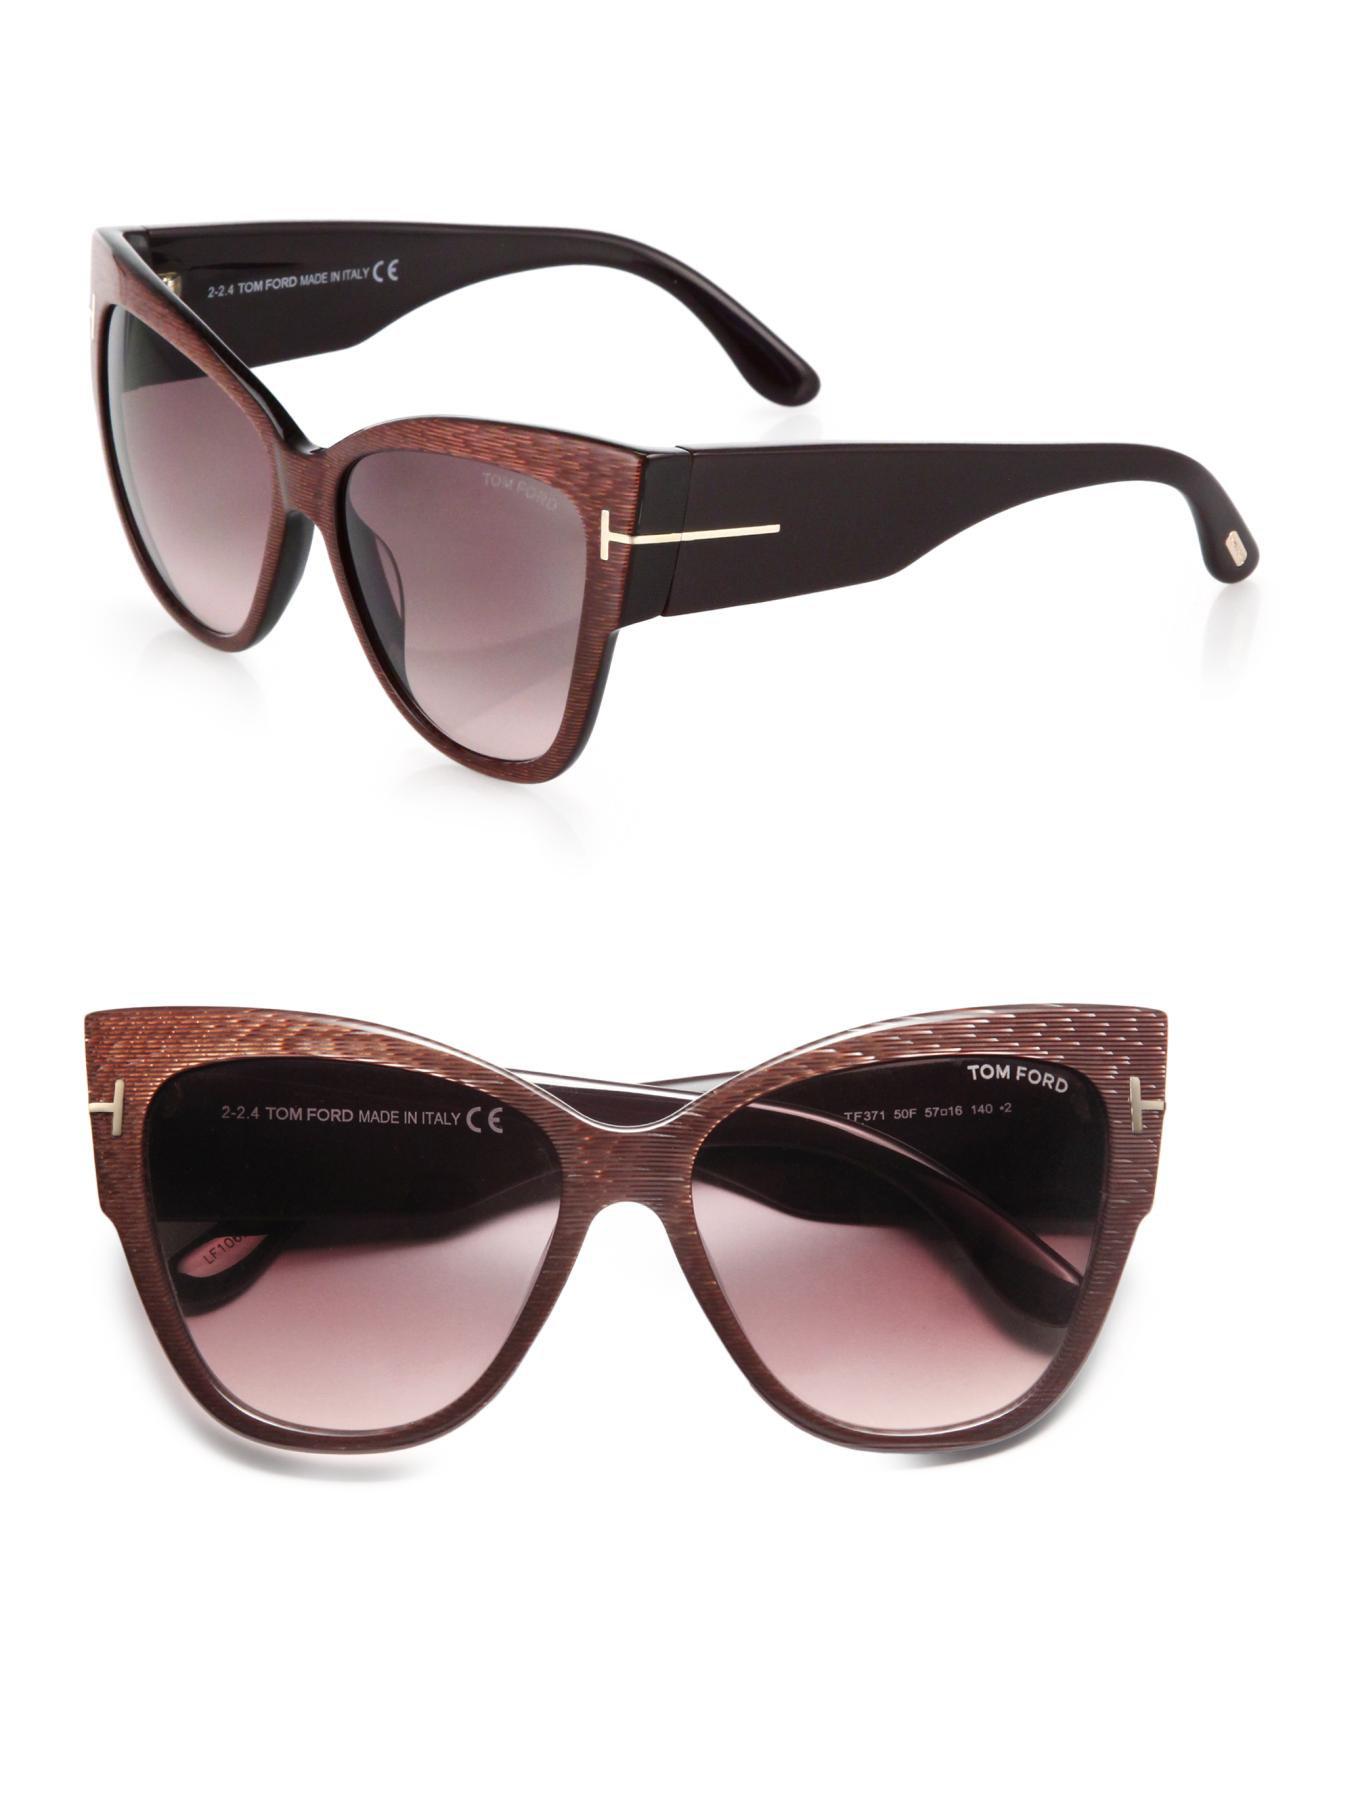 tom ford sunglasses cat eye louisiana bucket brigade. Black Bedroom Furniture Sets. Home Design Ideas